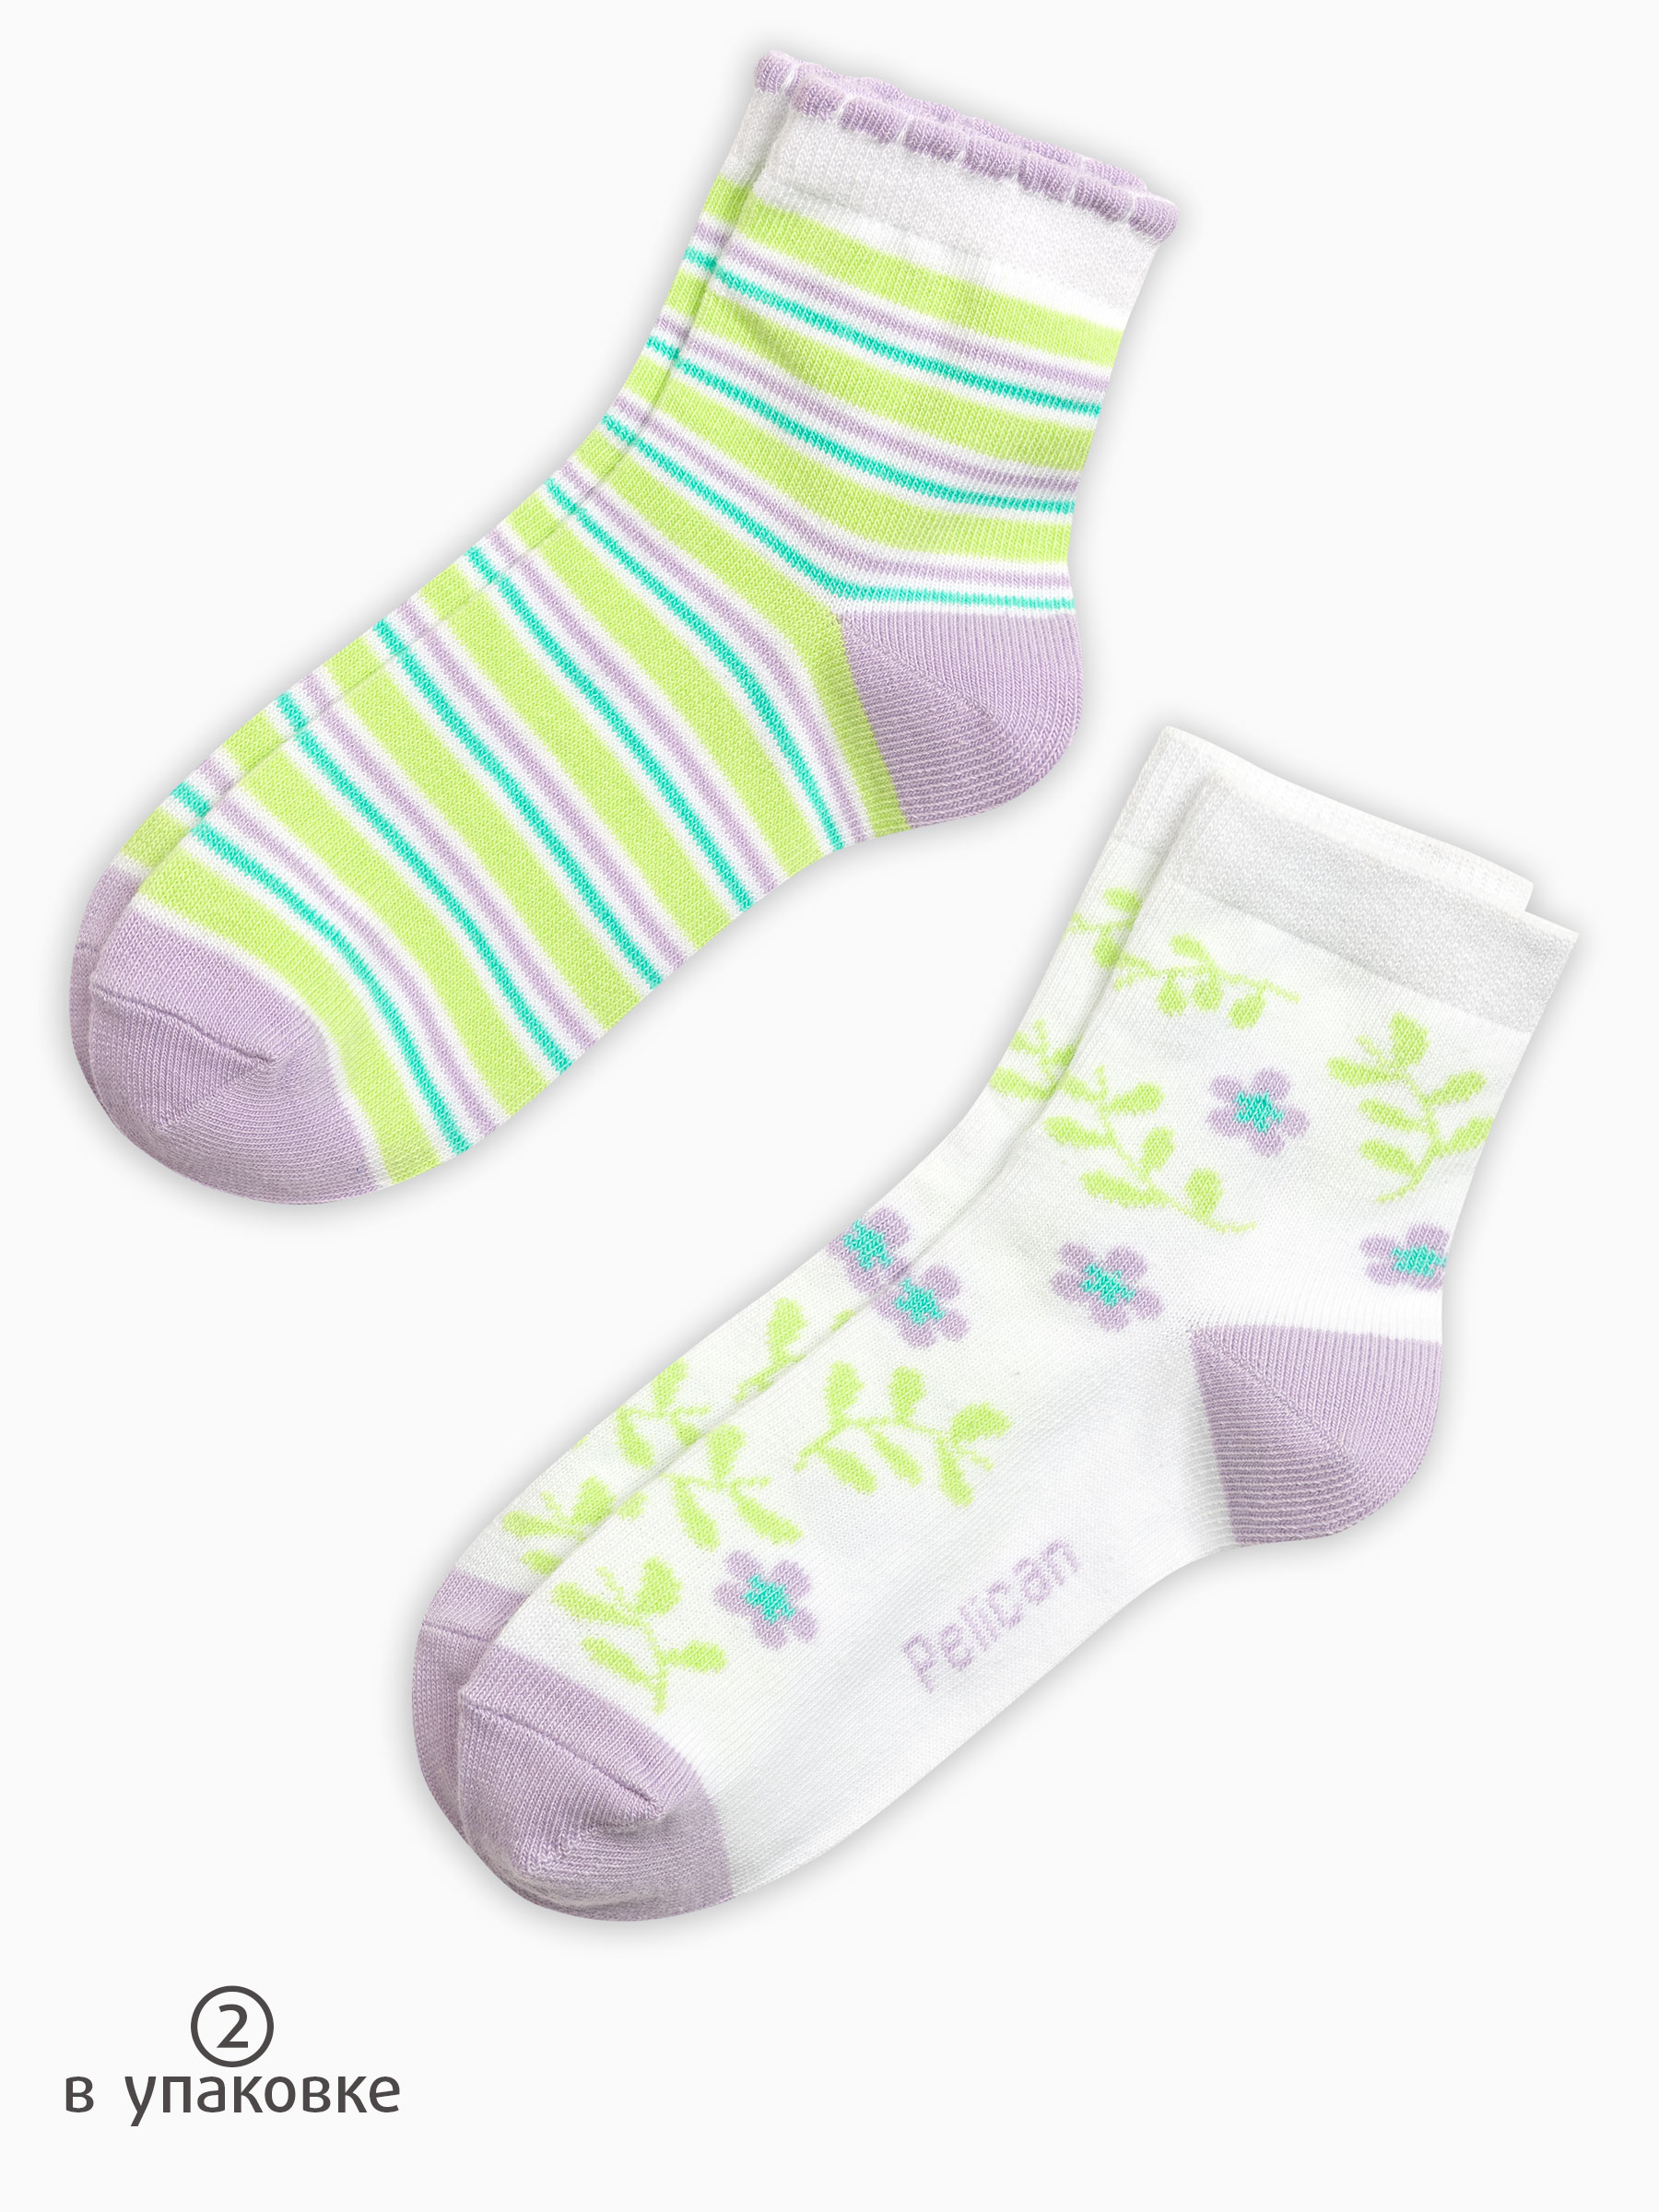 71a11437cbed9 Pelican GEG3108(2), носки детские для девочек 2 пары цвета белый ...